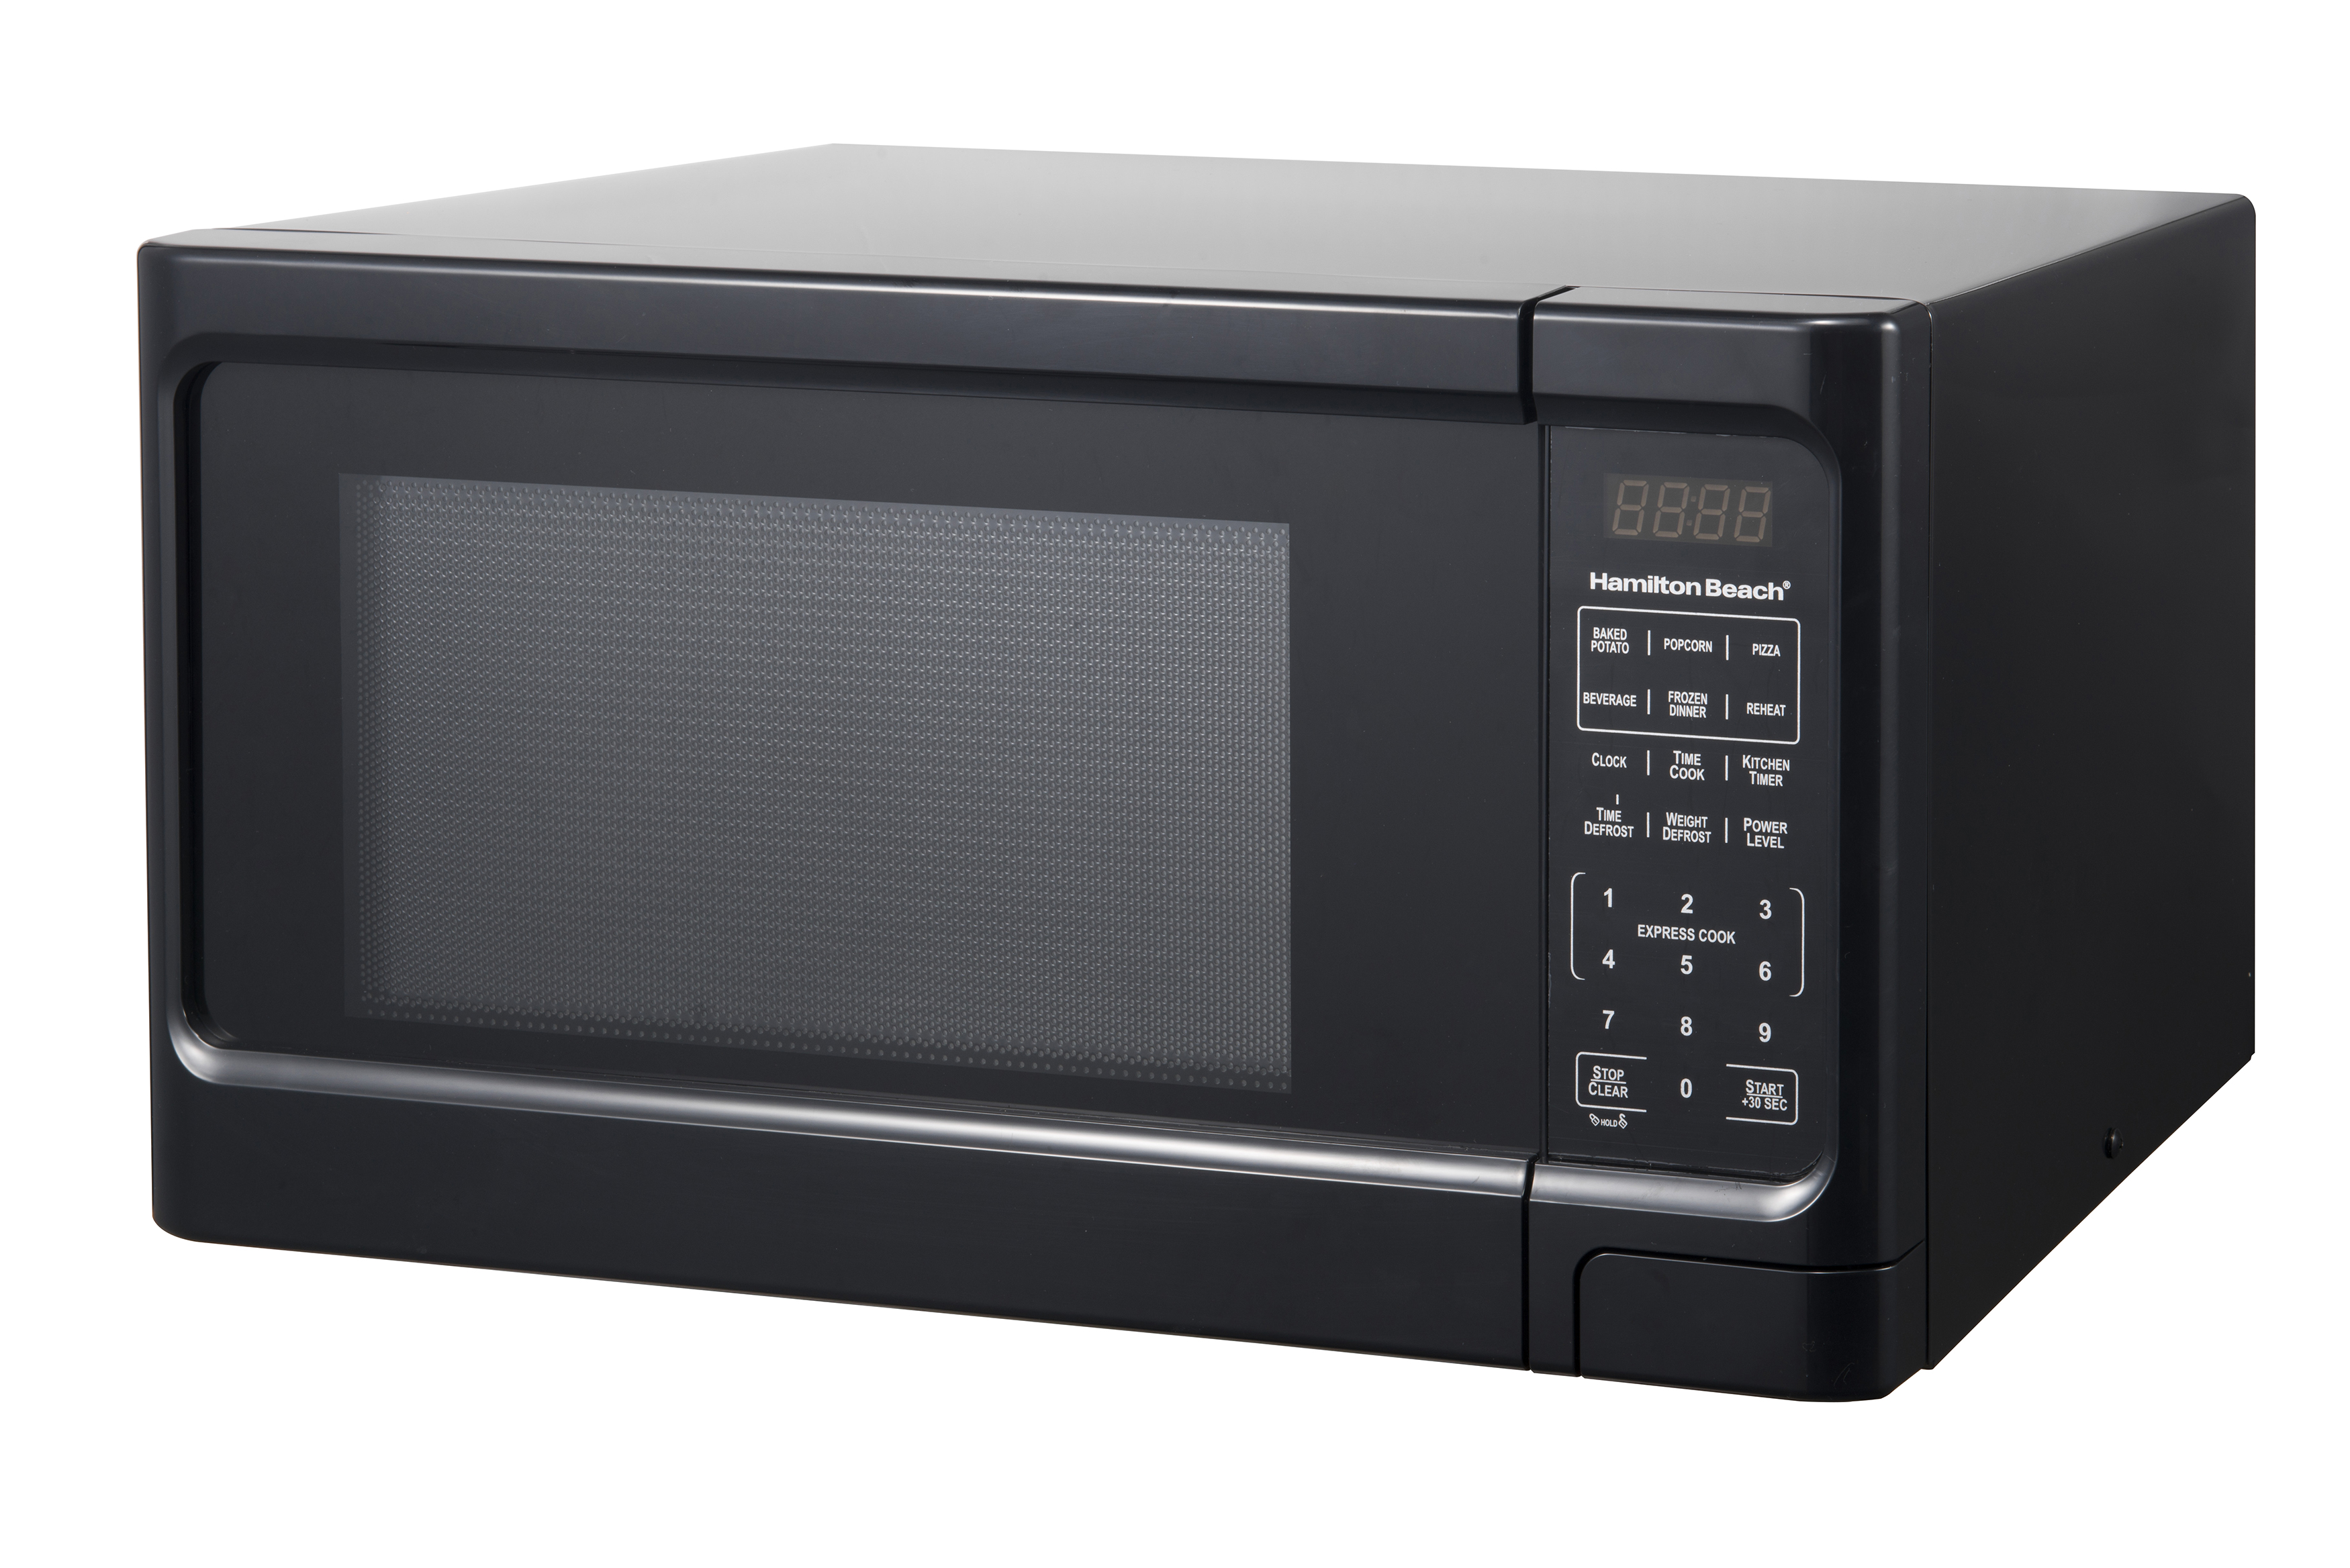 hamilton beach 1 1 cu ft black digital microwave oven walmart com